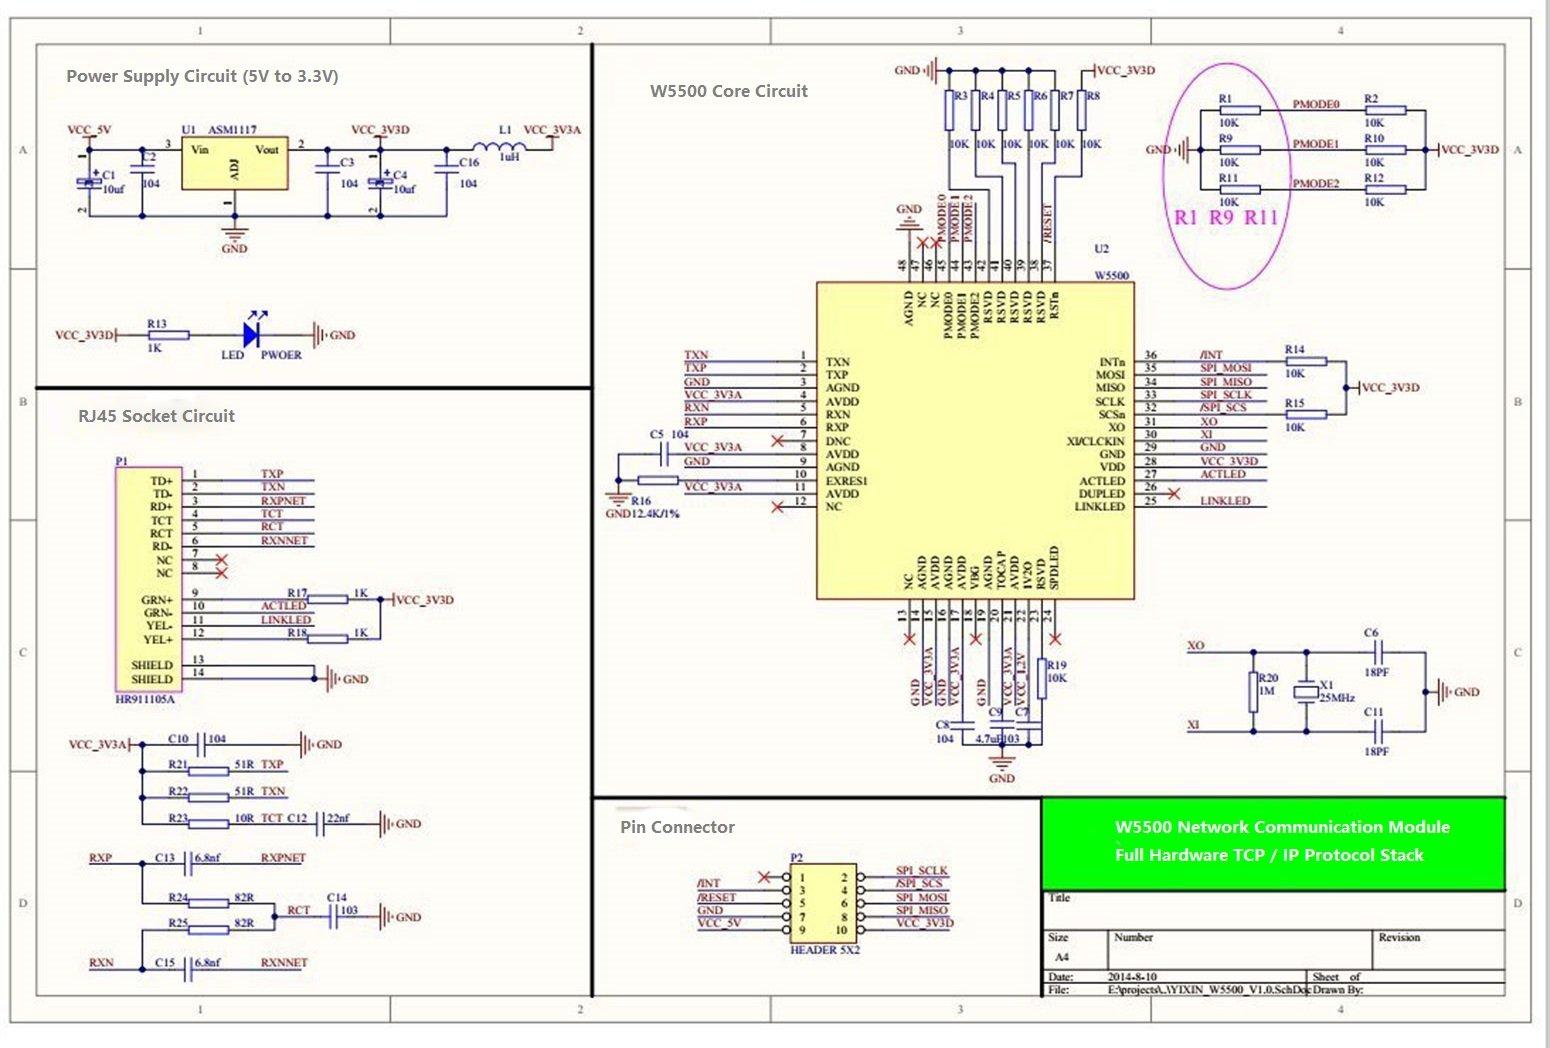 KNACRO W5500 Ethernet Network Module Hardware TCP/IP 51/STM32 Microcontroller Program over W5100 by KNACRO (Image #4)